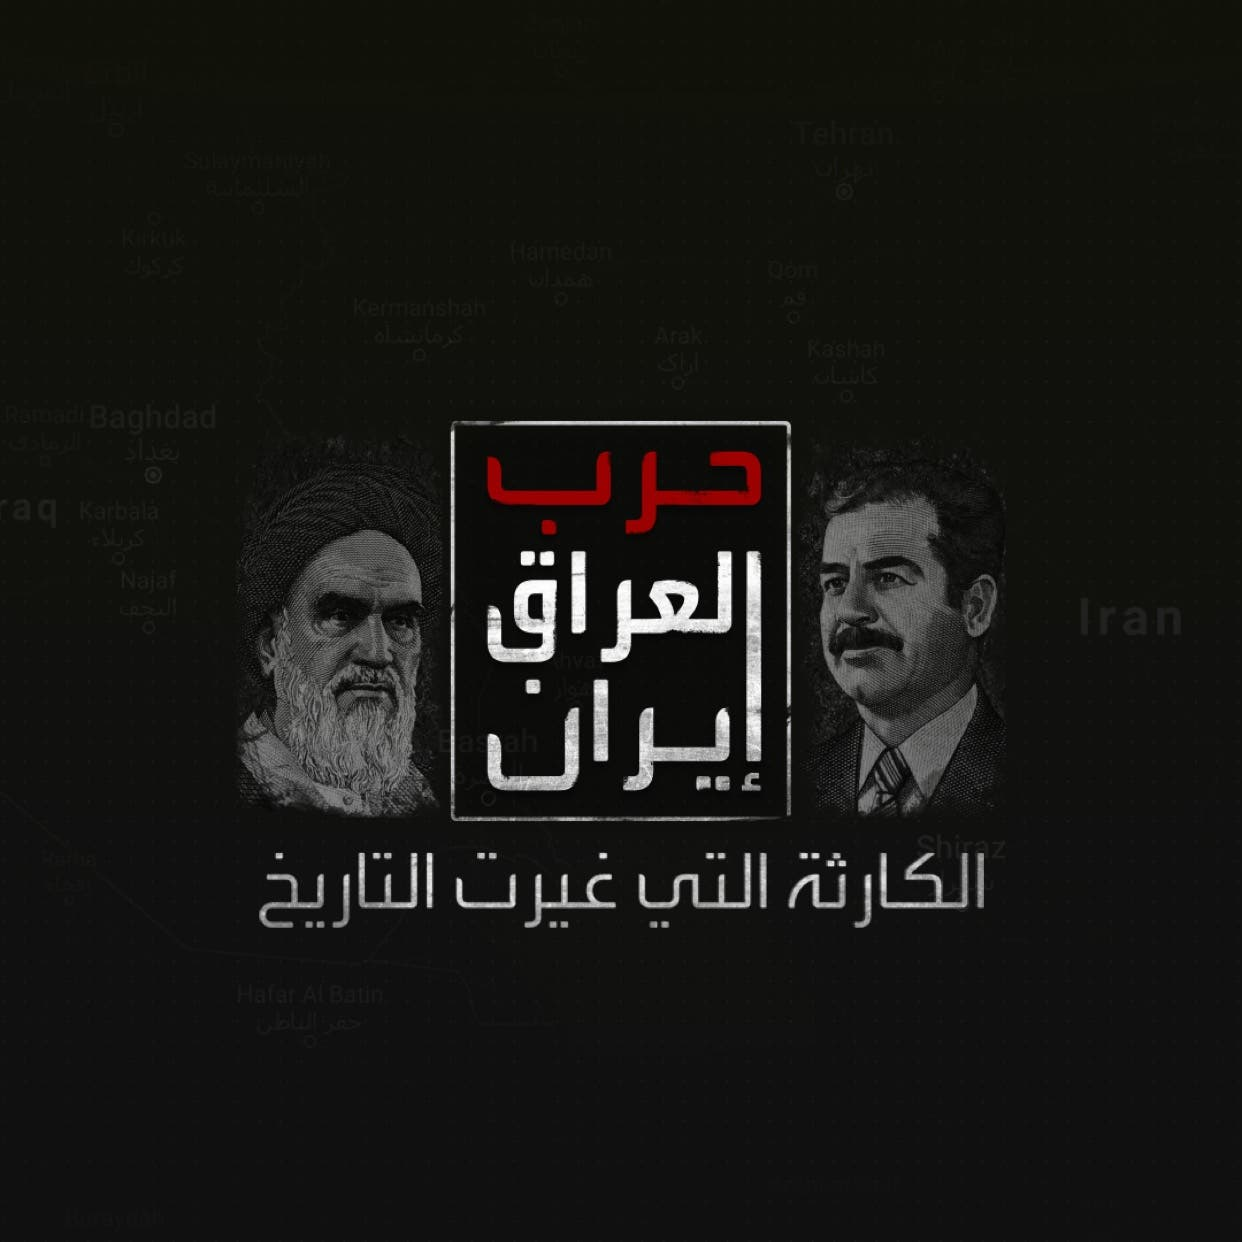 AA-IraqIranWar-Mobile-1-1-1242x1242